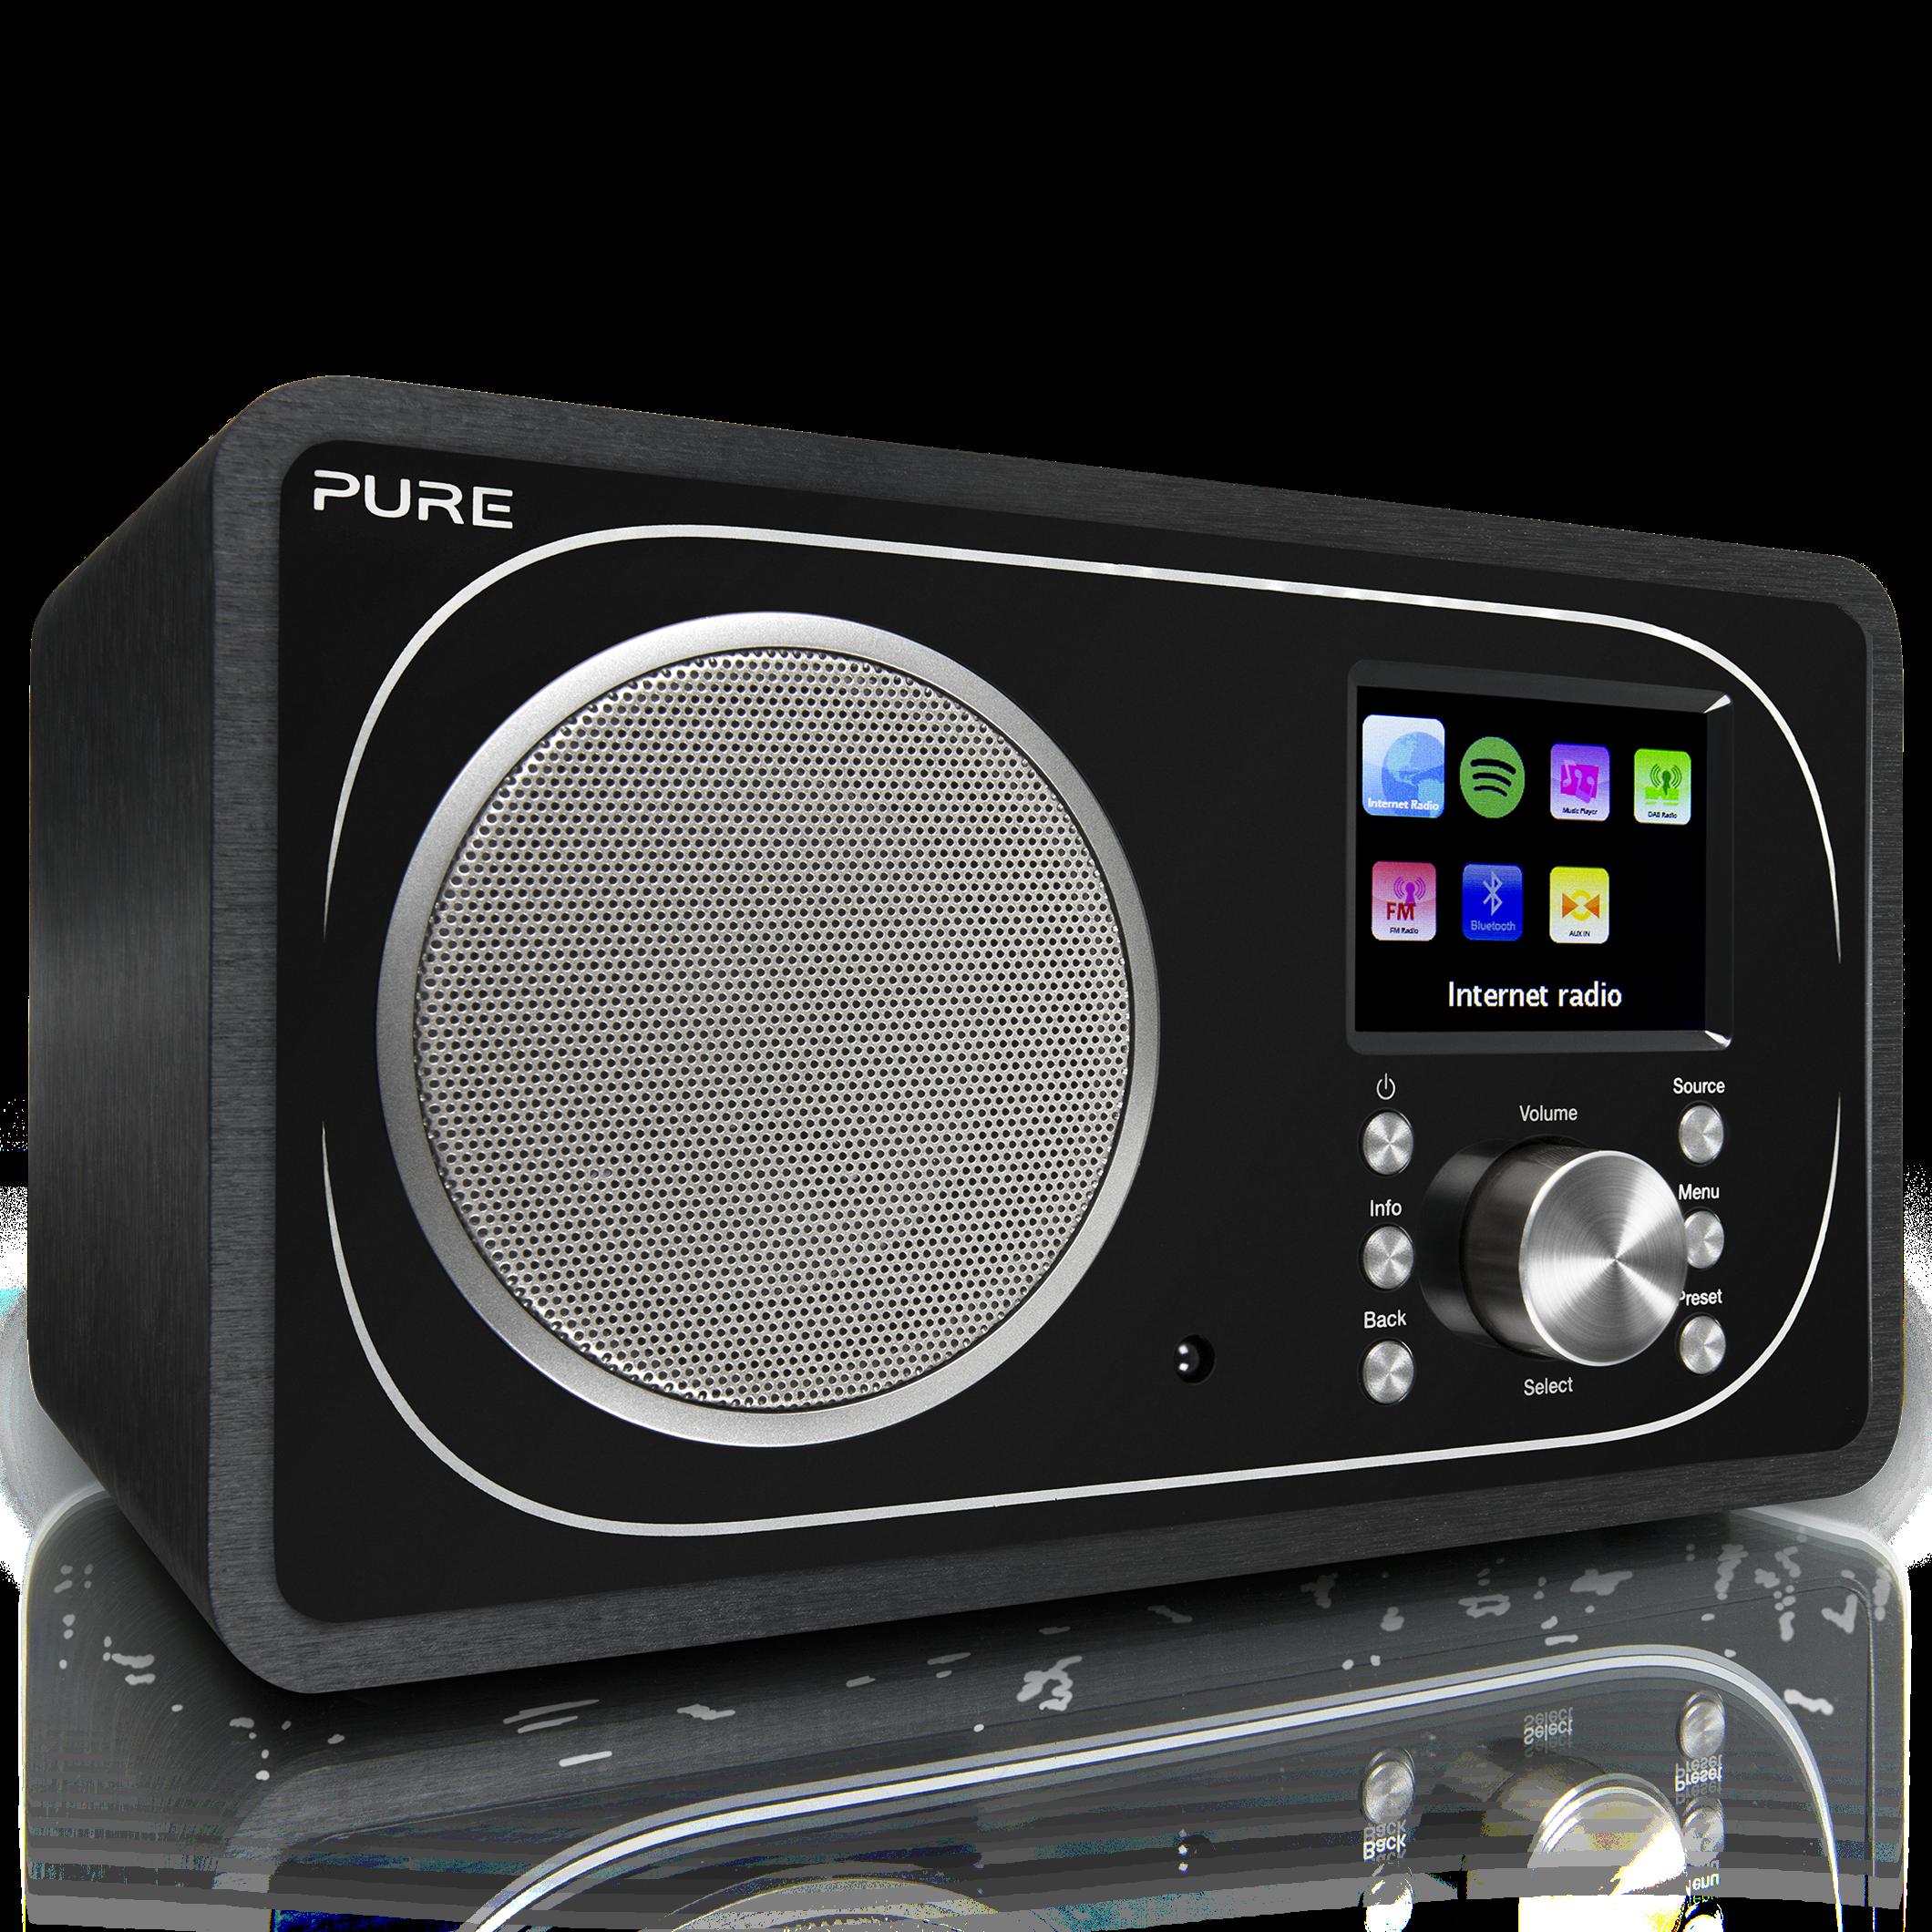 Pure - Evoke F3 BT Internet/FM/DAB+ Radio